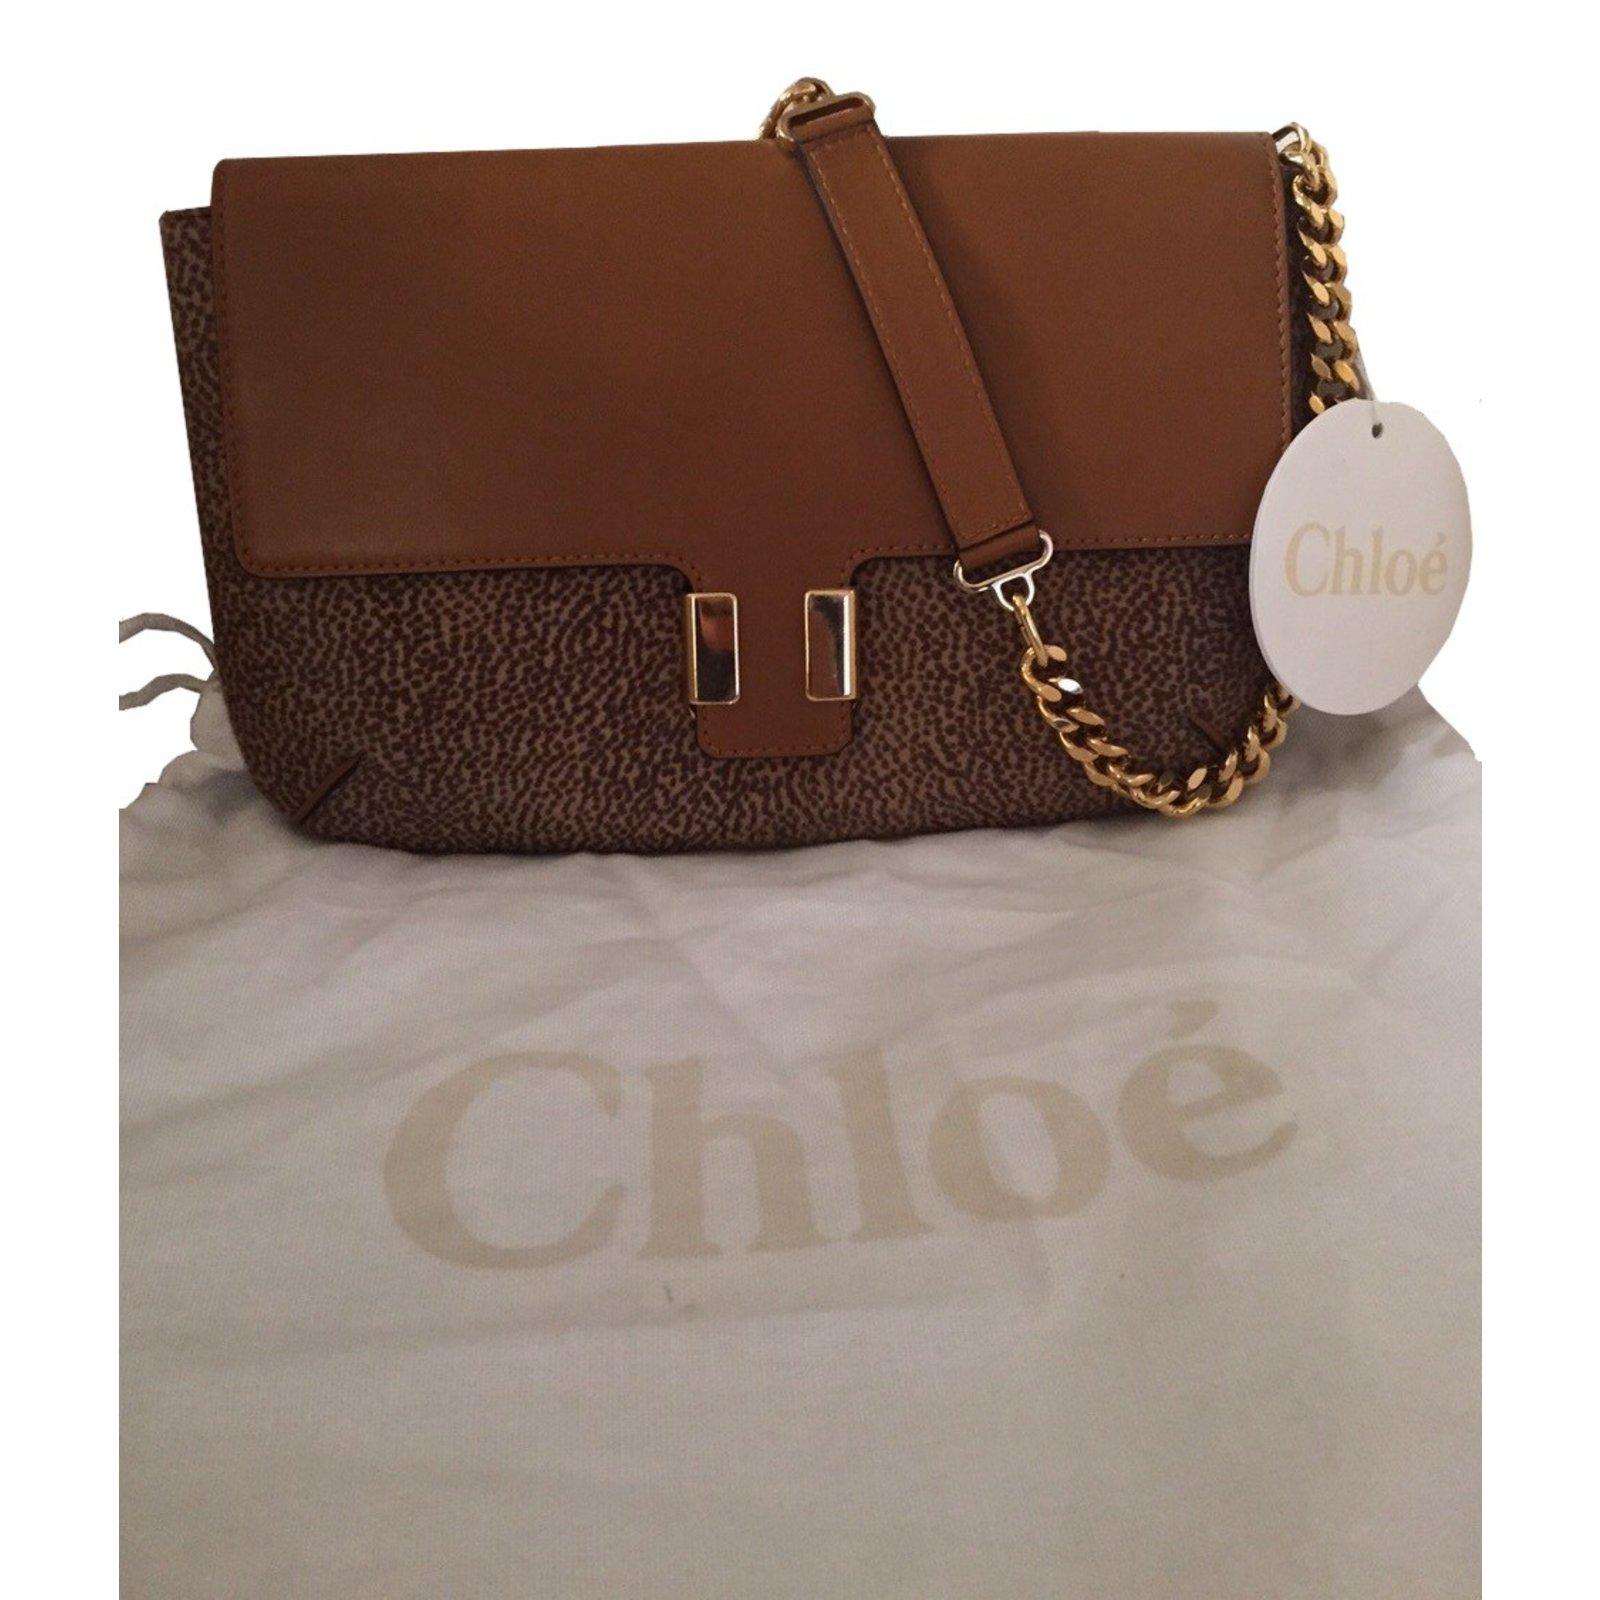 sacs main chlo sac main chlo cuir beige joli closet. Black Bedroom Furniture Sets. Home Design Ideas